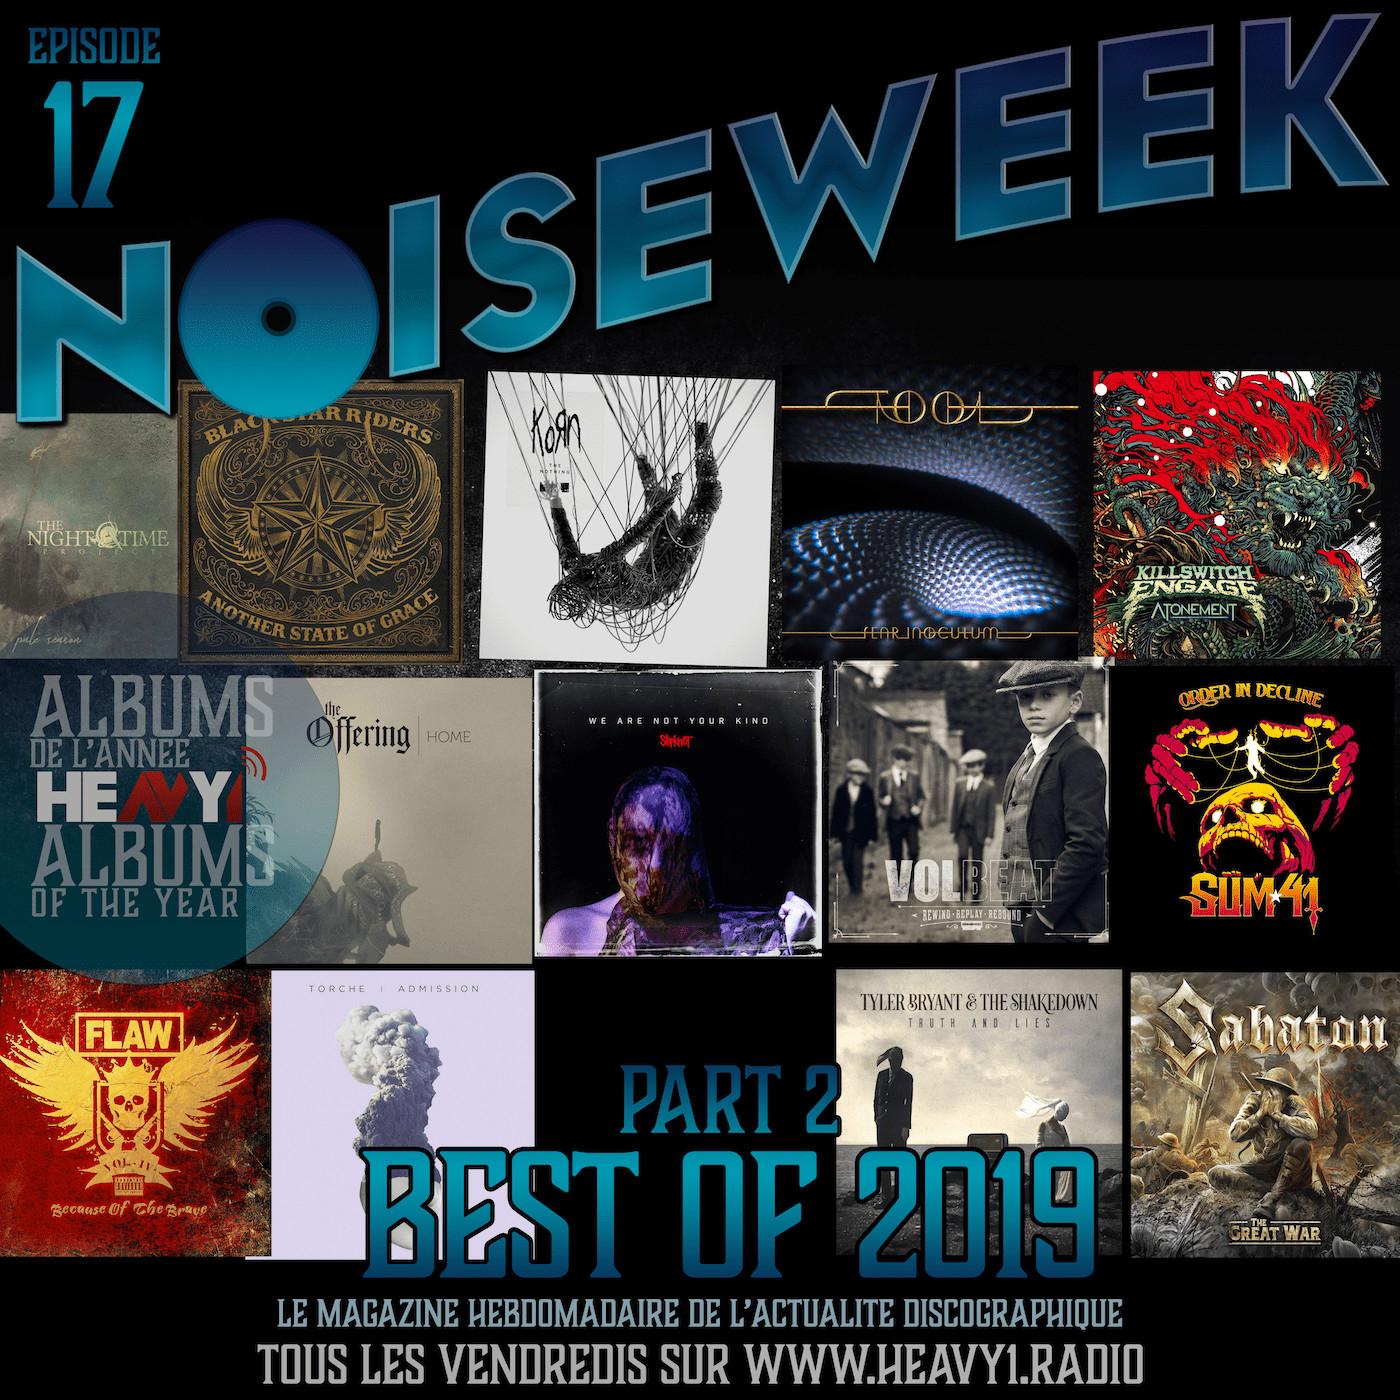 Noiseweek #17 Saison 3